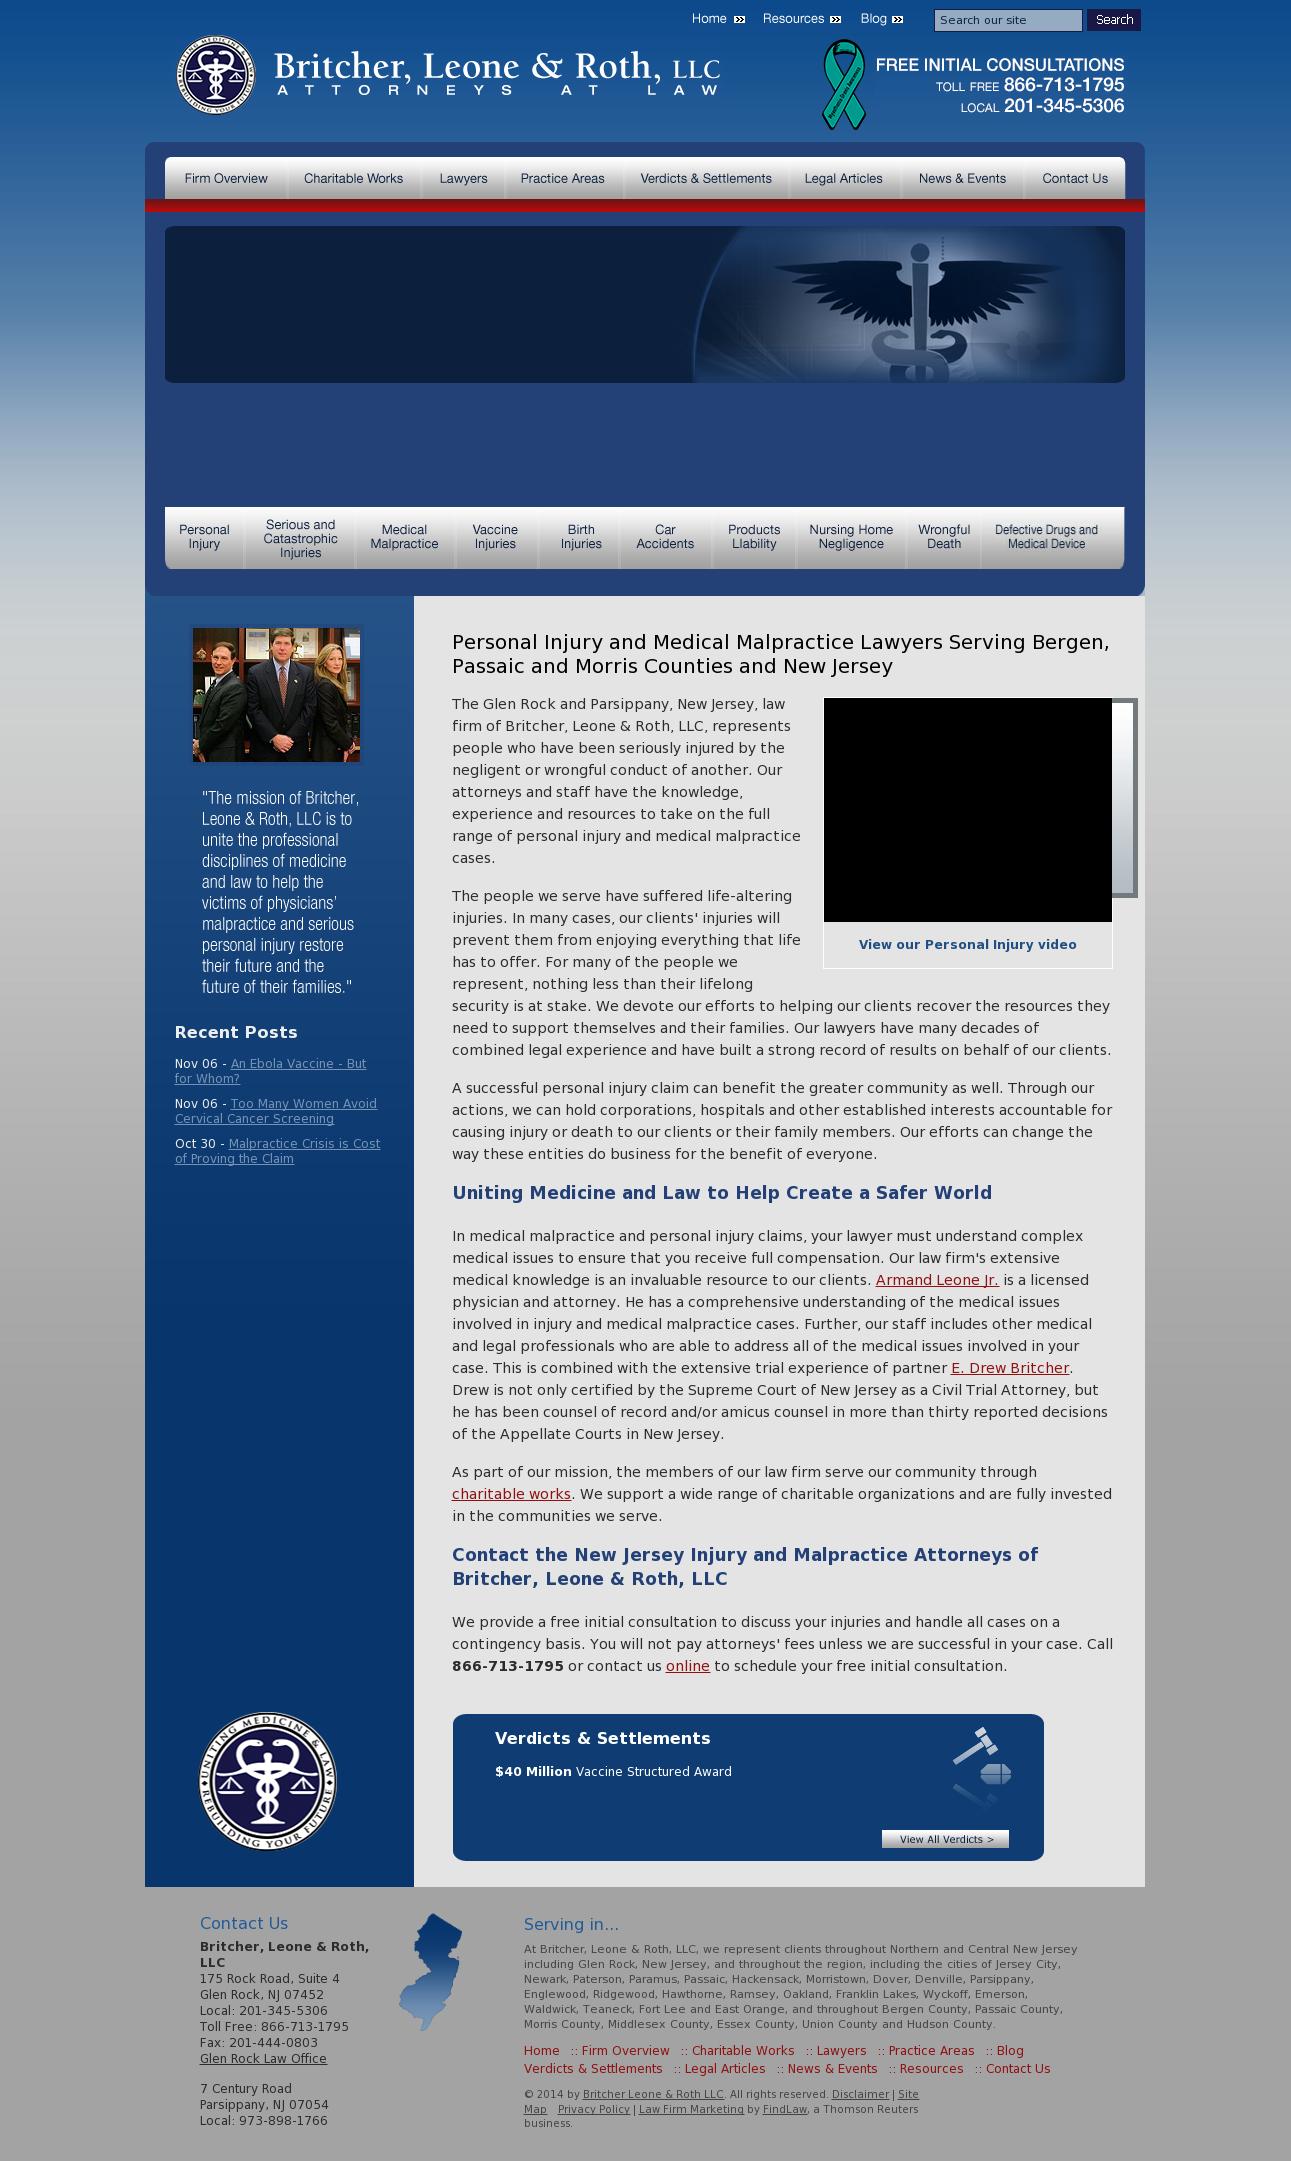 Britcher, Leone & Roth Law Firm Competitors, Revenue and